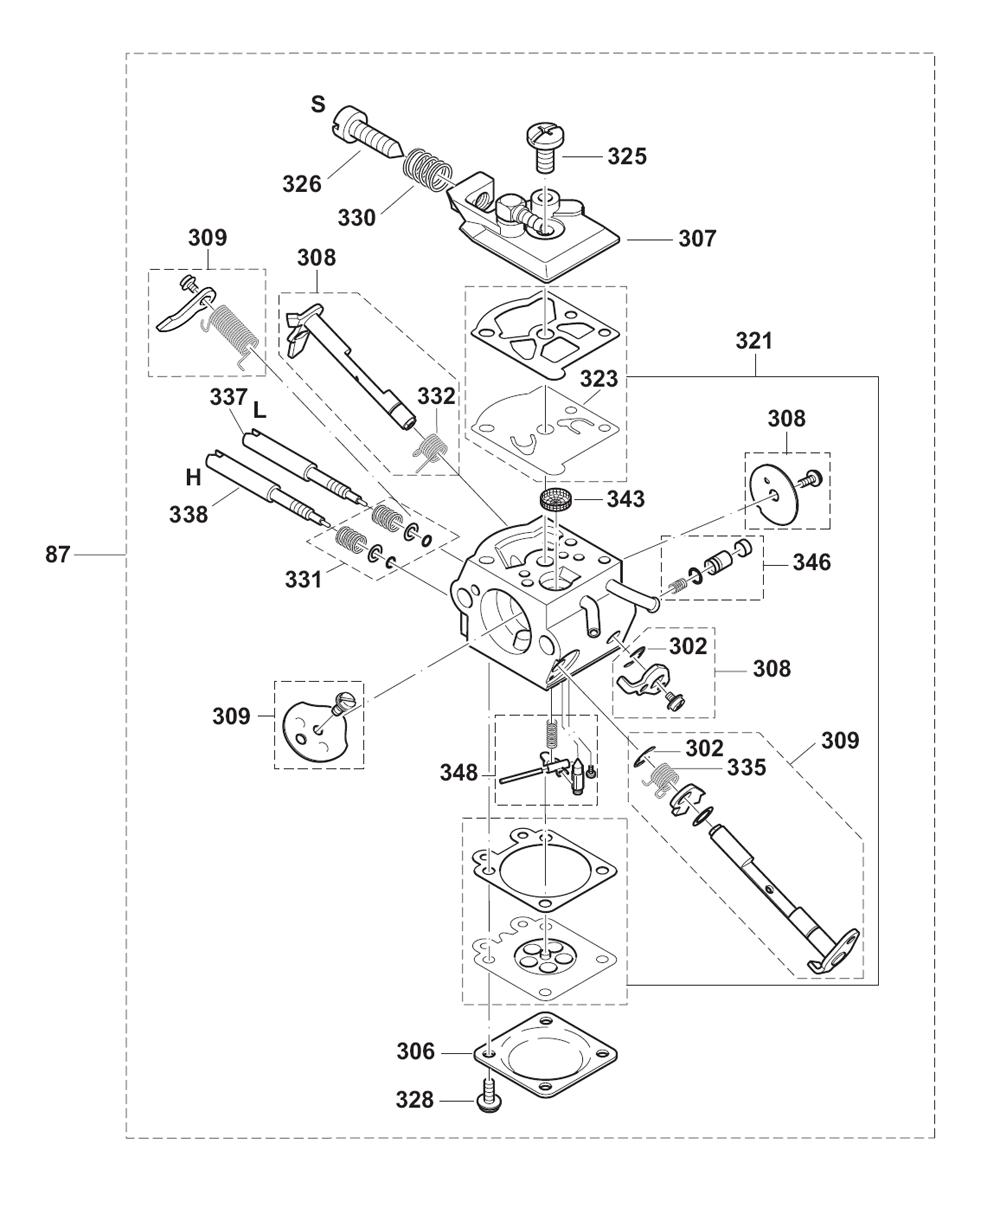 tlc engine diagram wiring library Briggs and Stratton Ignition Wiring Diagram for Mod 195437 ps 33 c tlc dolmar pb 6break down